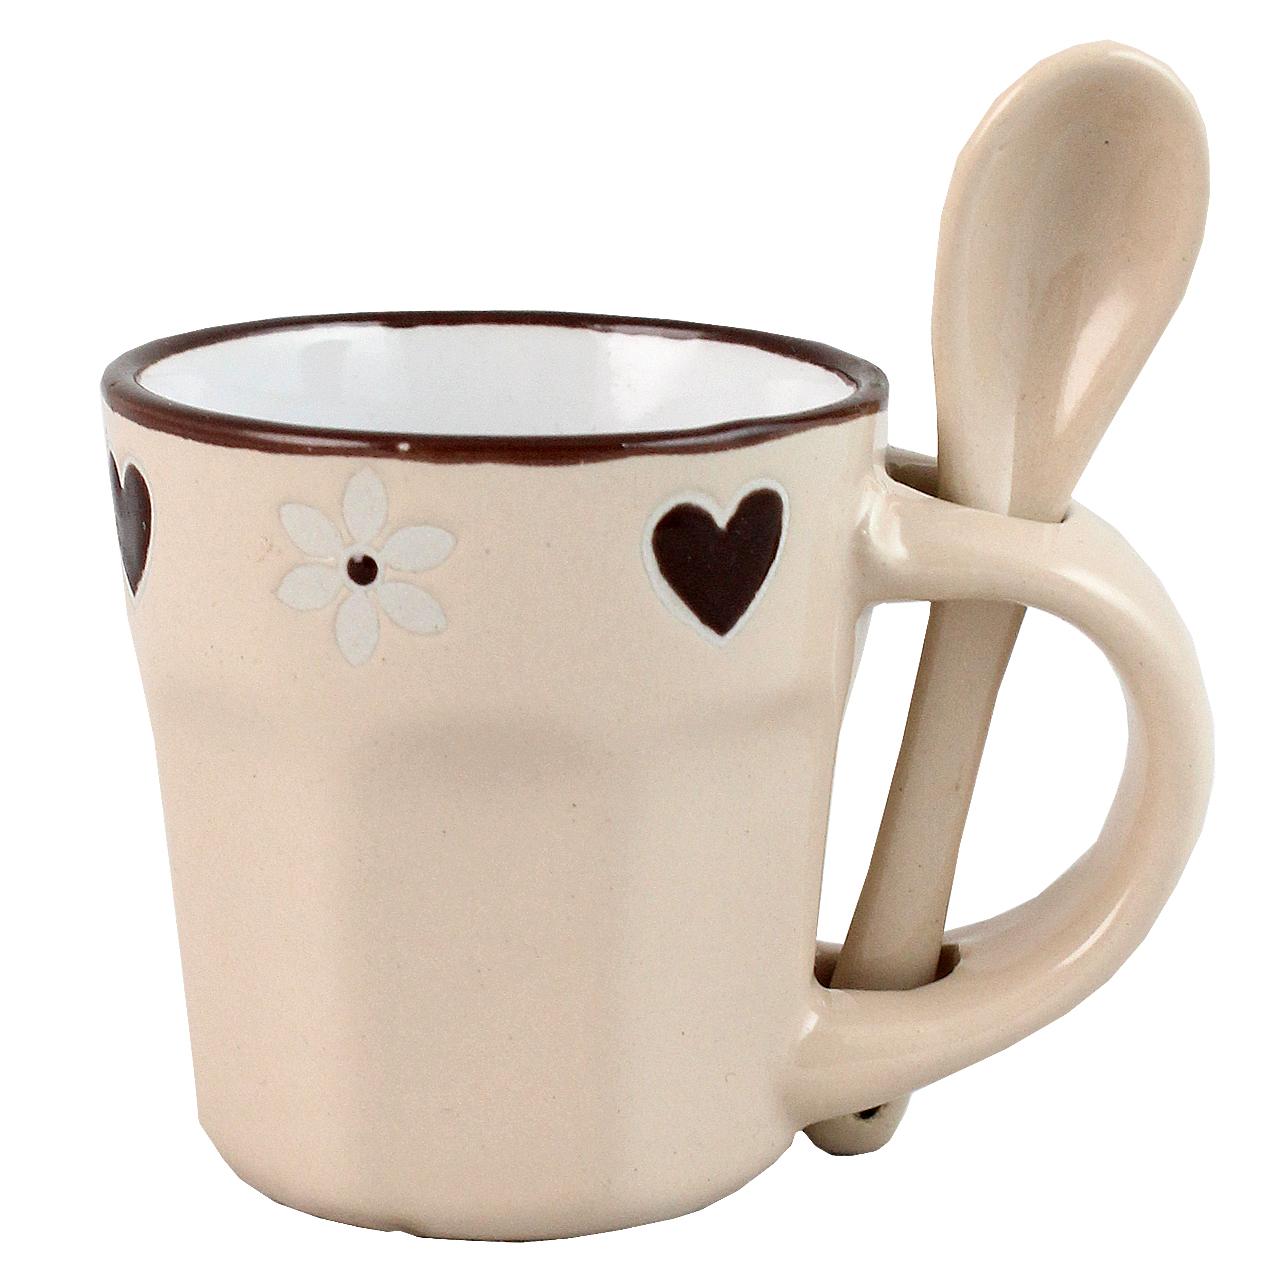 Cana Cu Lingurita Din Ceramica Bej 6 Cm